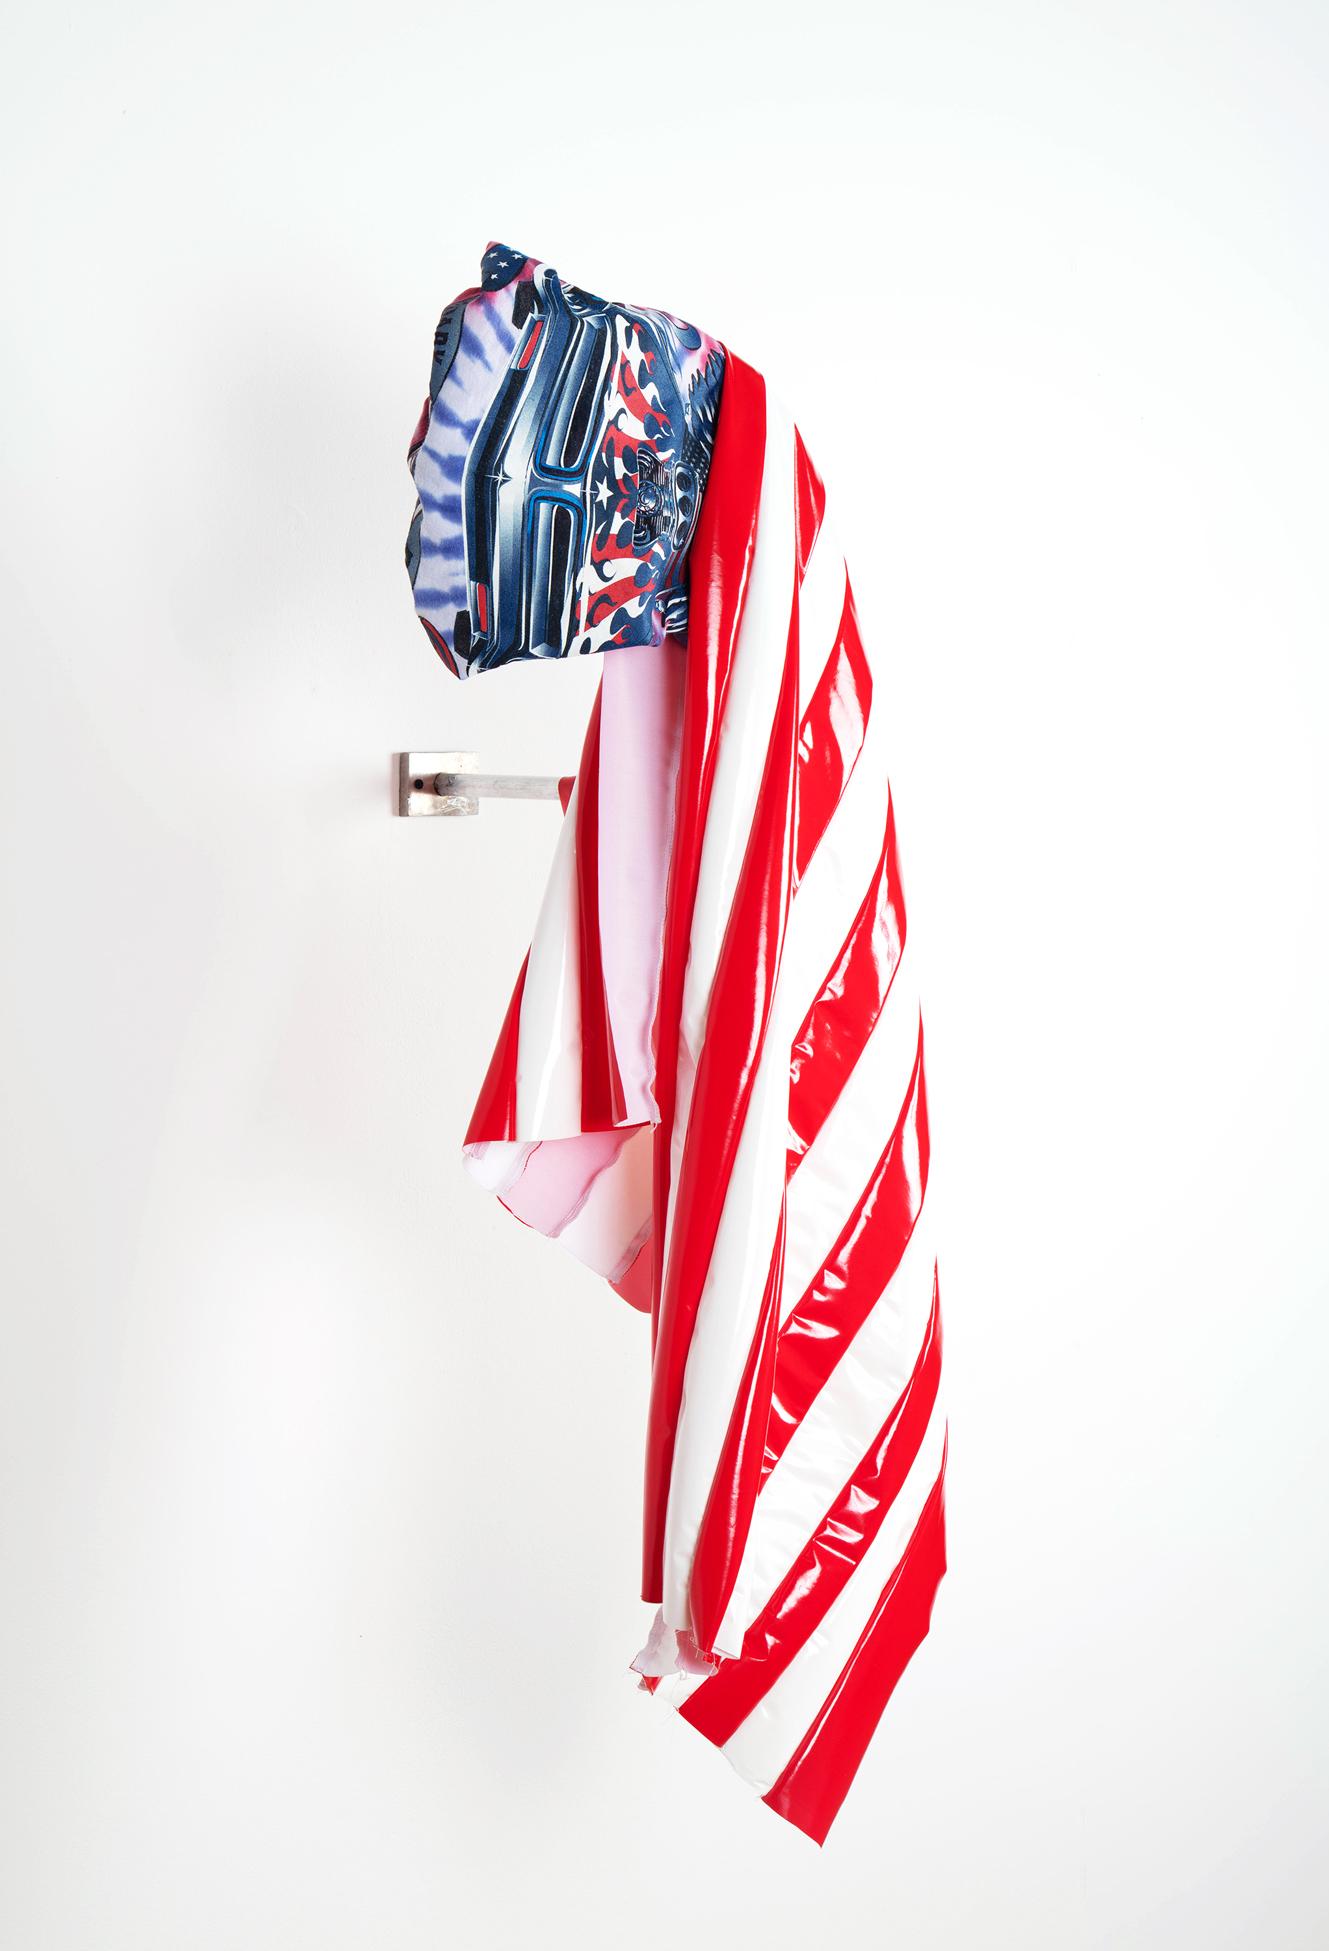 USA (legendary, power), 2017  Goodwill t-shirt, vinyl fabric, aluminum, hardware  16x39x15 inches